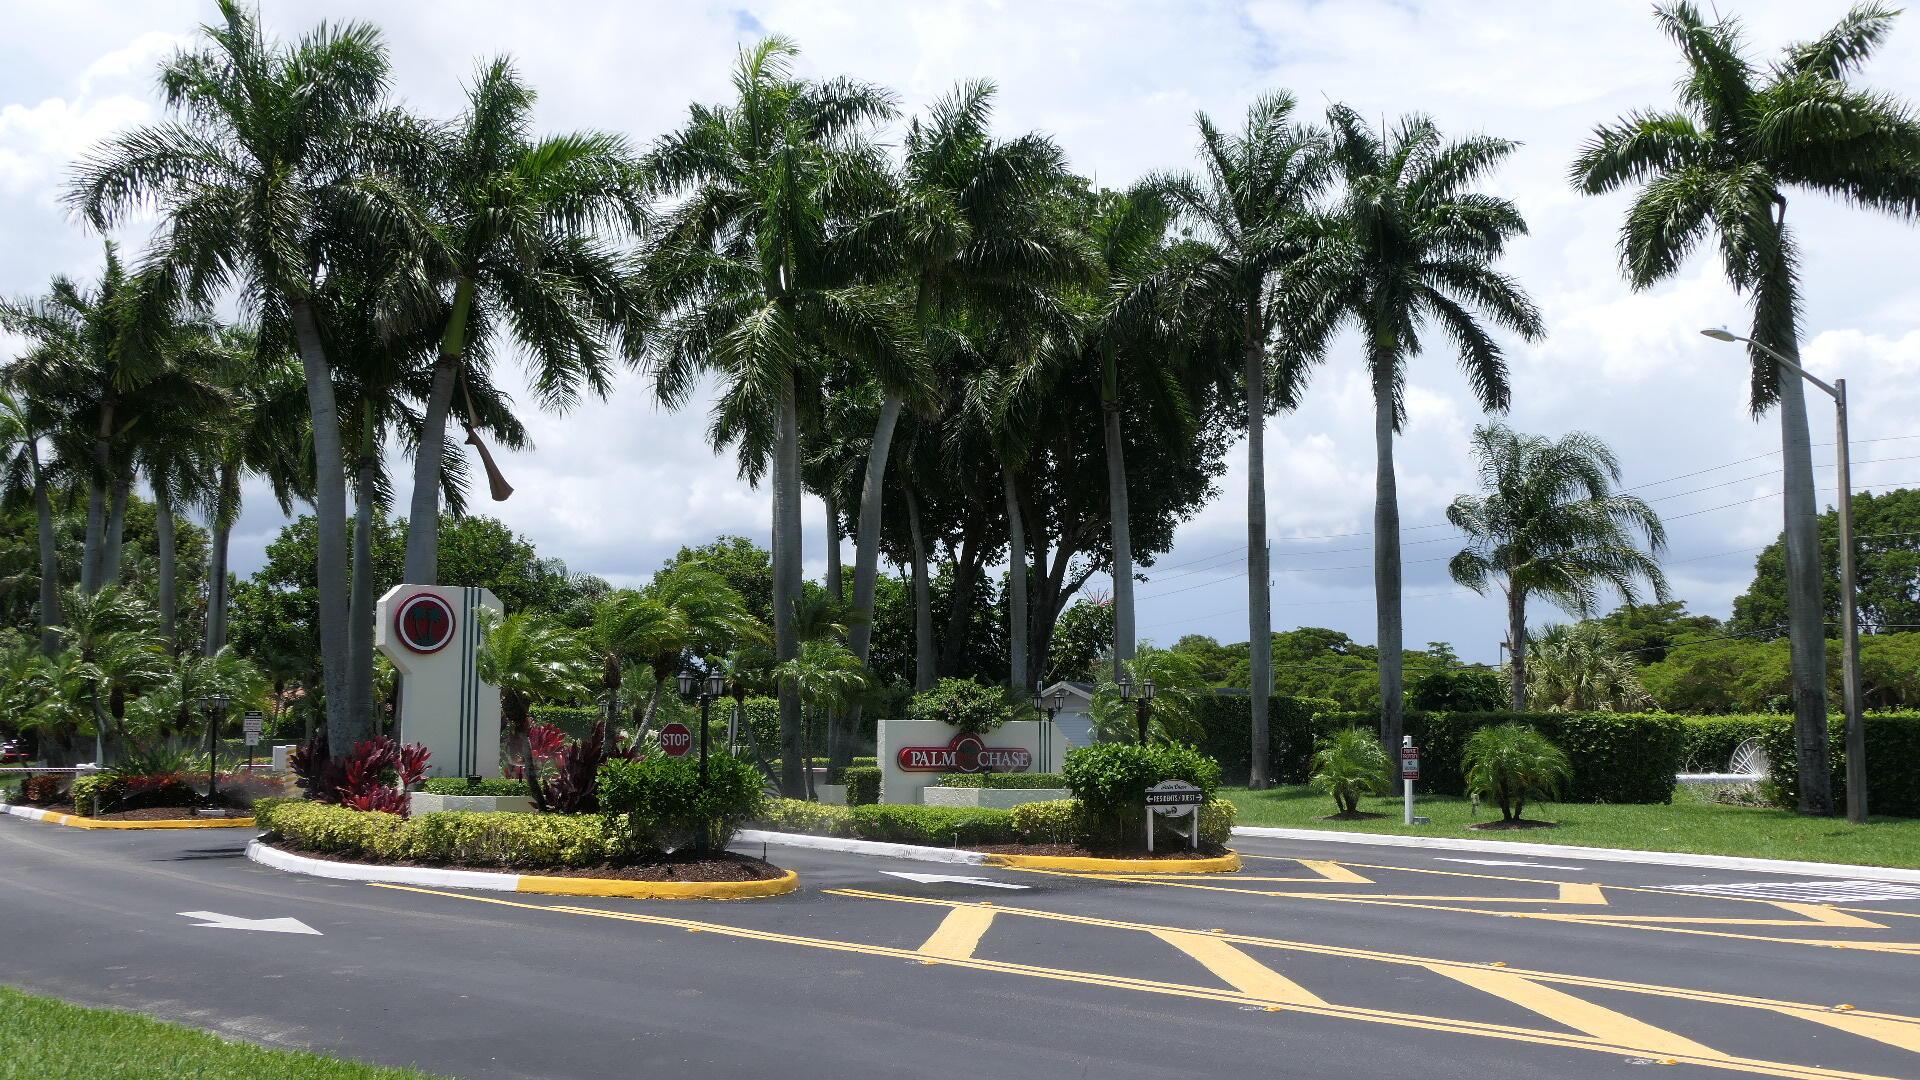 10804 Bahama Palm Way 101 Boynton Beach, FL 33437 photo 53